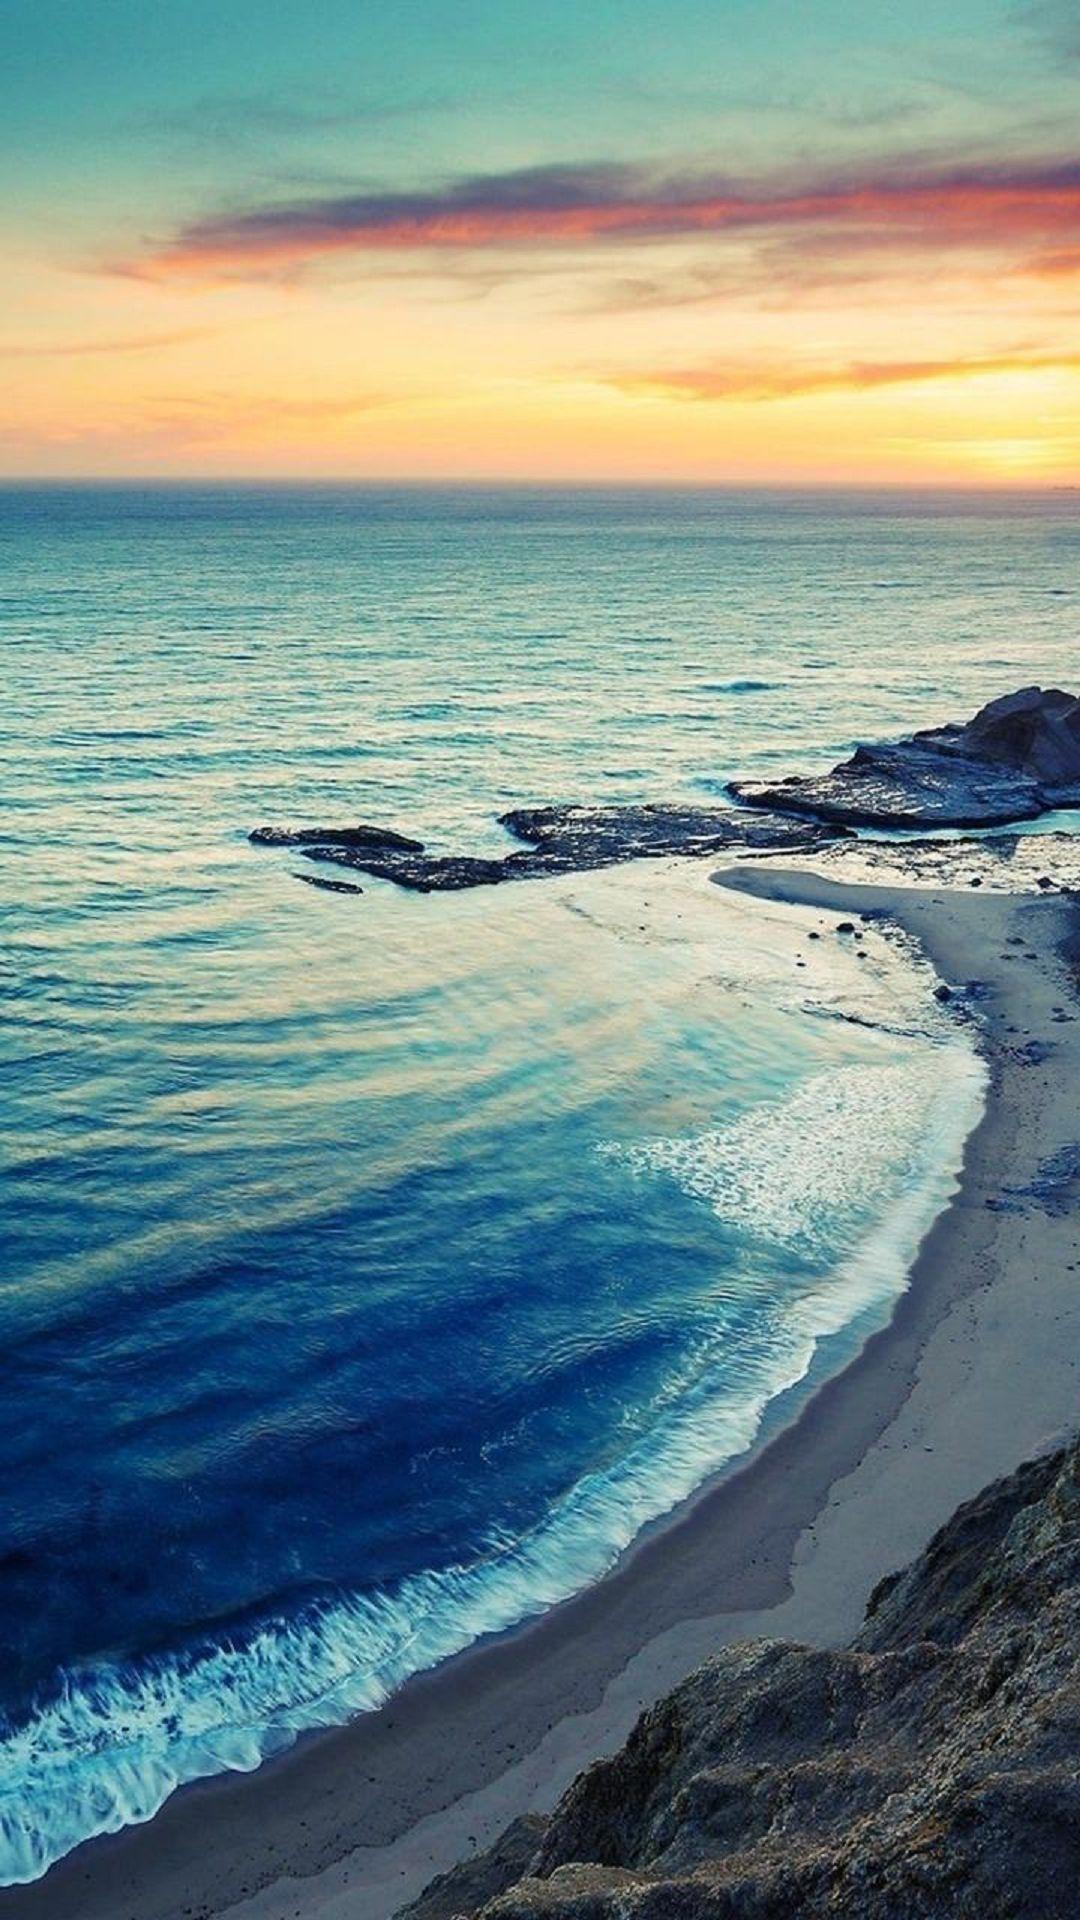 Nature iPhone 6 Plus Wallpapers - Sunrise Beach Seaside Coast iPhone 6 Plus HD Wallpaper #iPhone ...